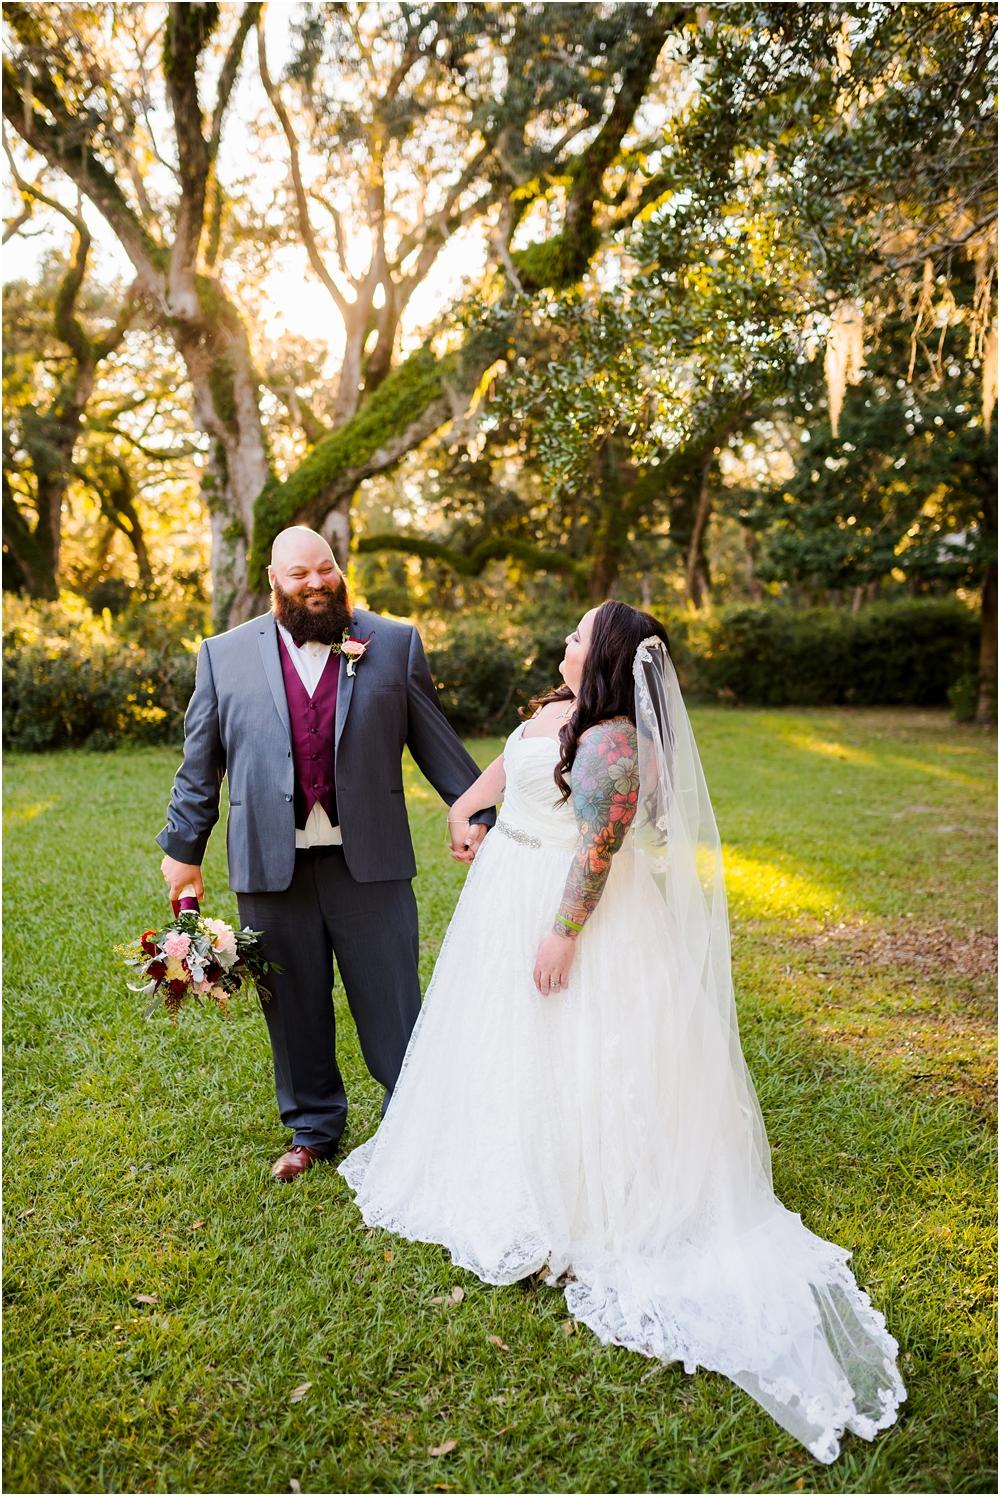 Eden-Gardens-florida-wedding-photographer-kiersten-stevenson-photography-85.jpg